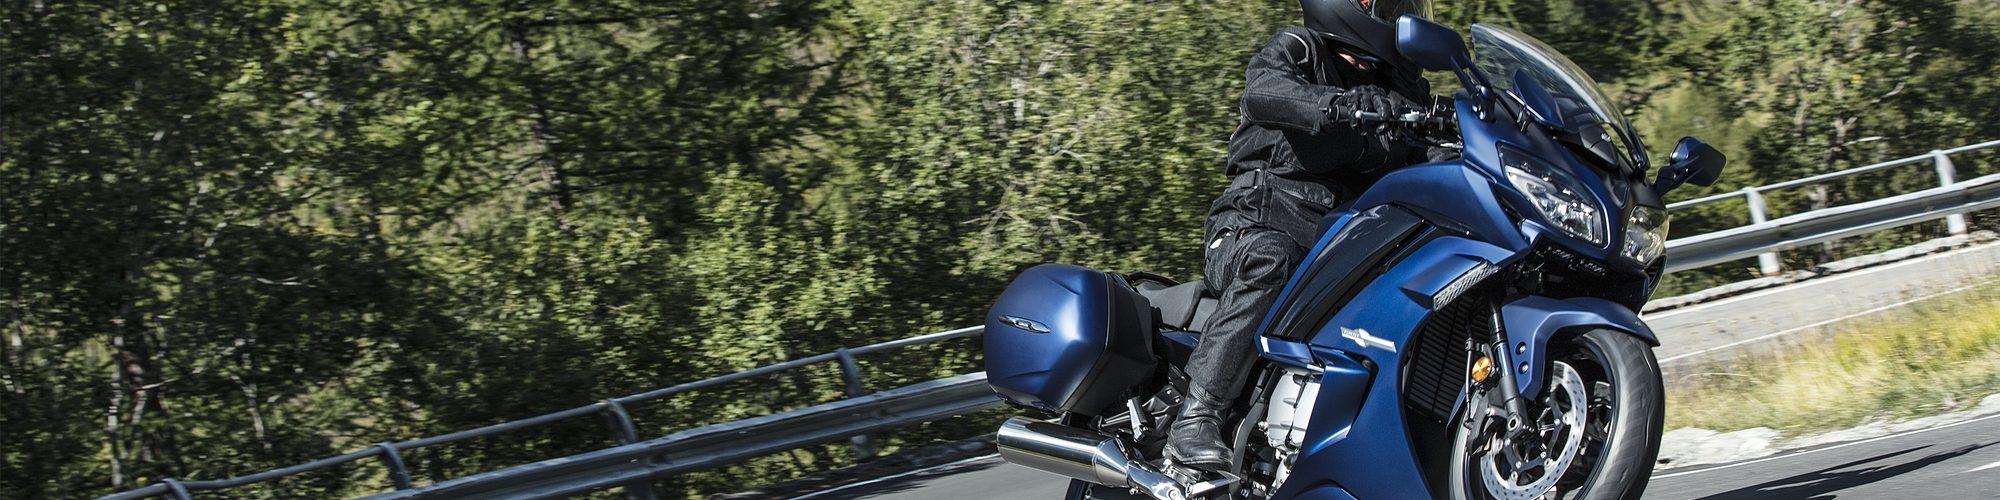 Yamaha FJR1300AE | MotorCentrumWest